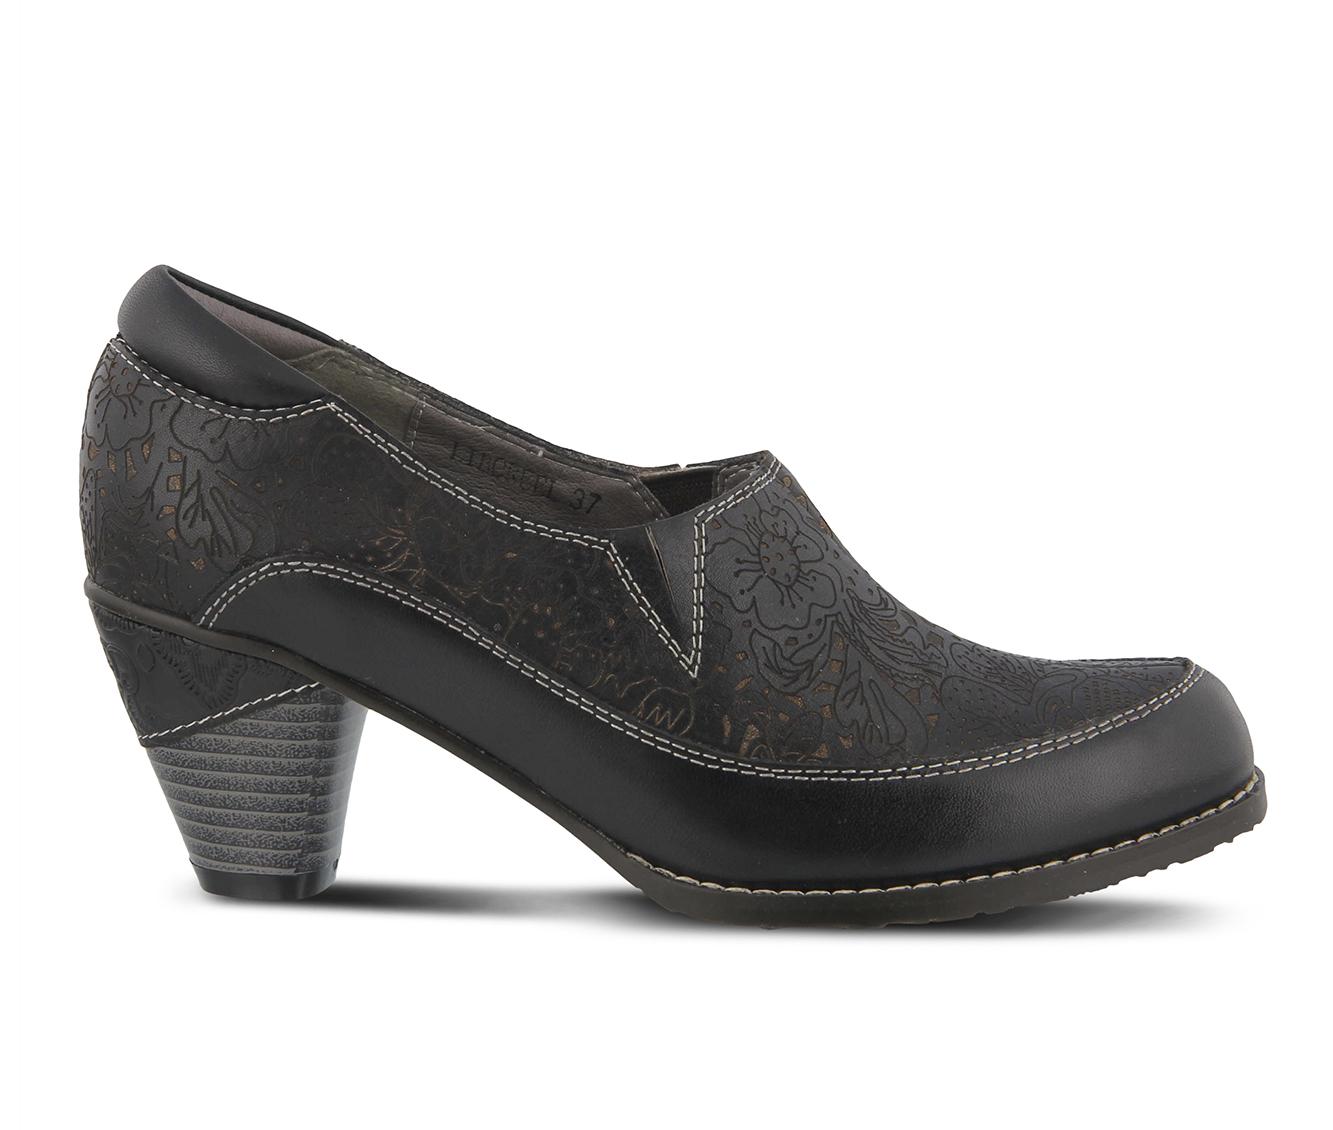 L'Artiste Liboreel Women's Dress Shoe (Black Leather)